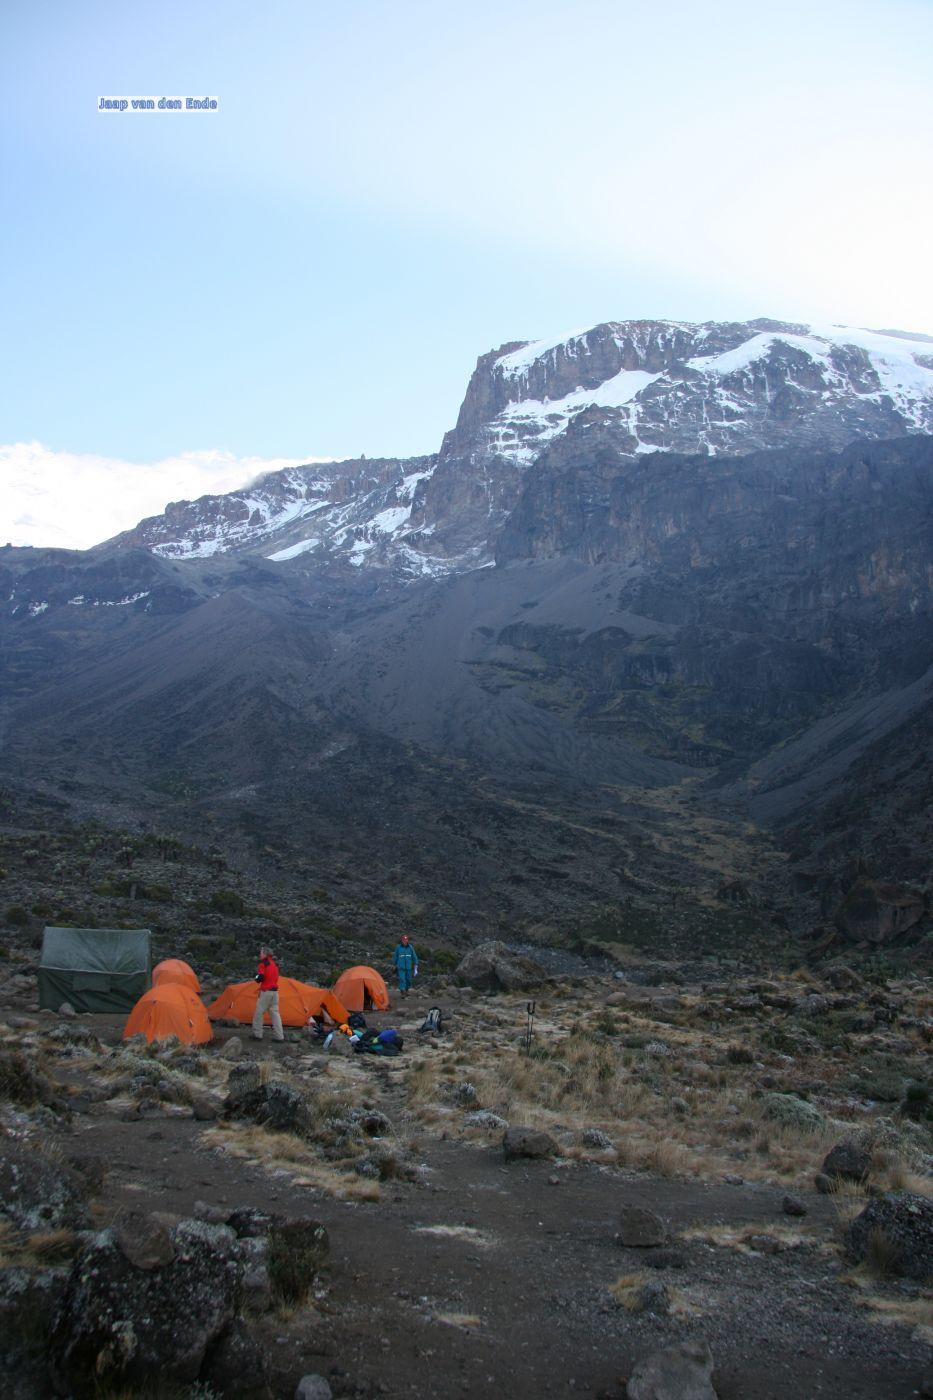 Kilimanjaro climb, Tanzania